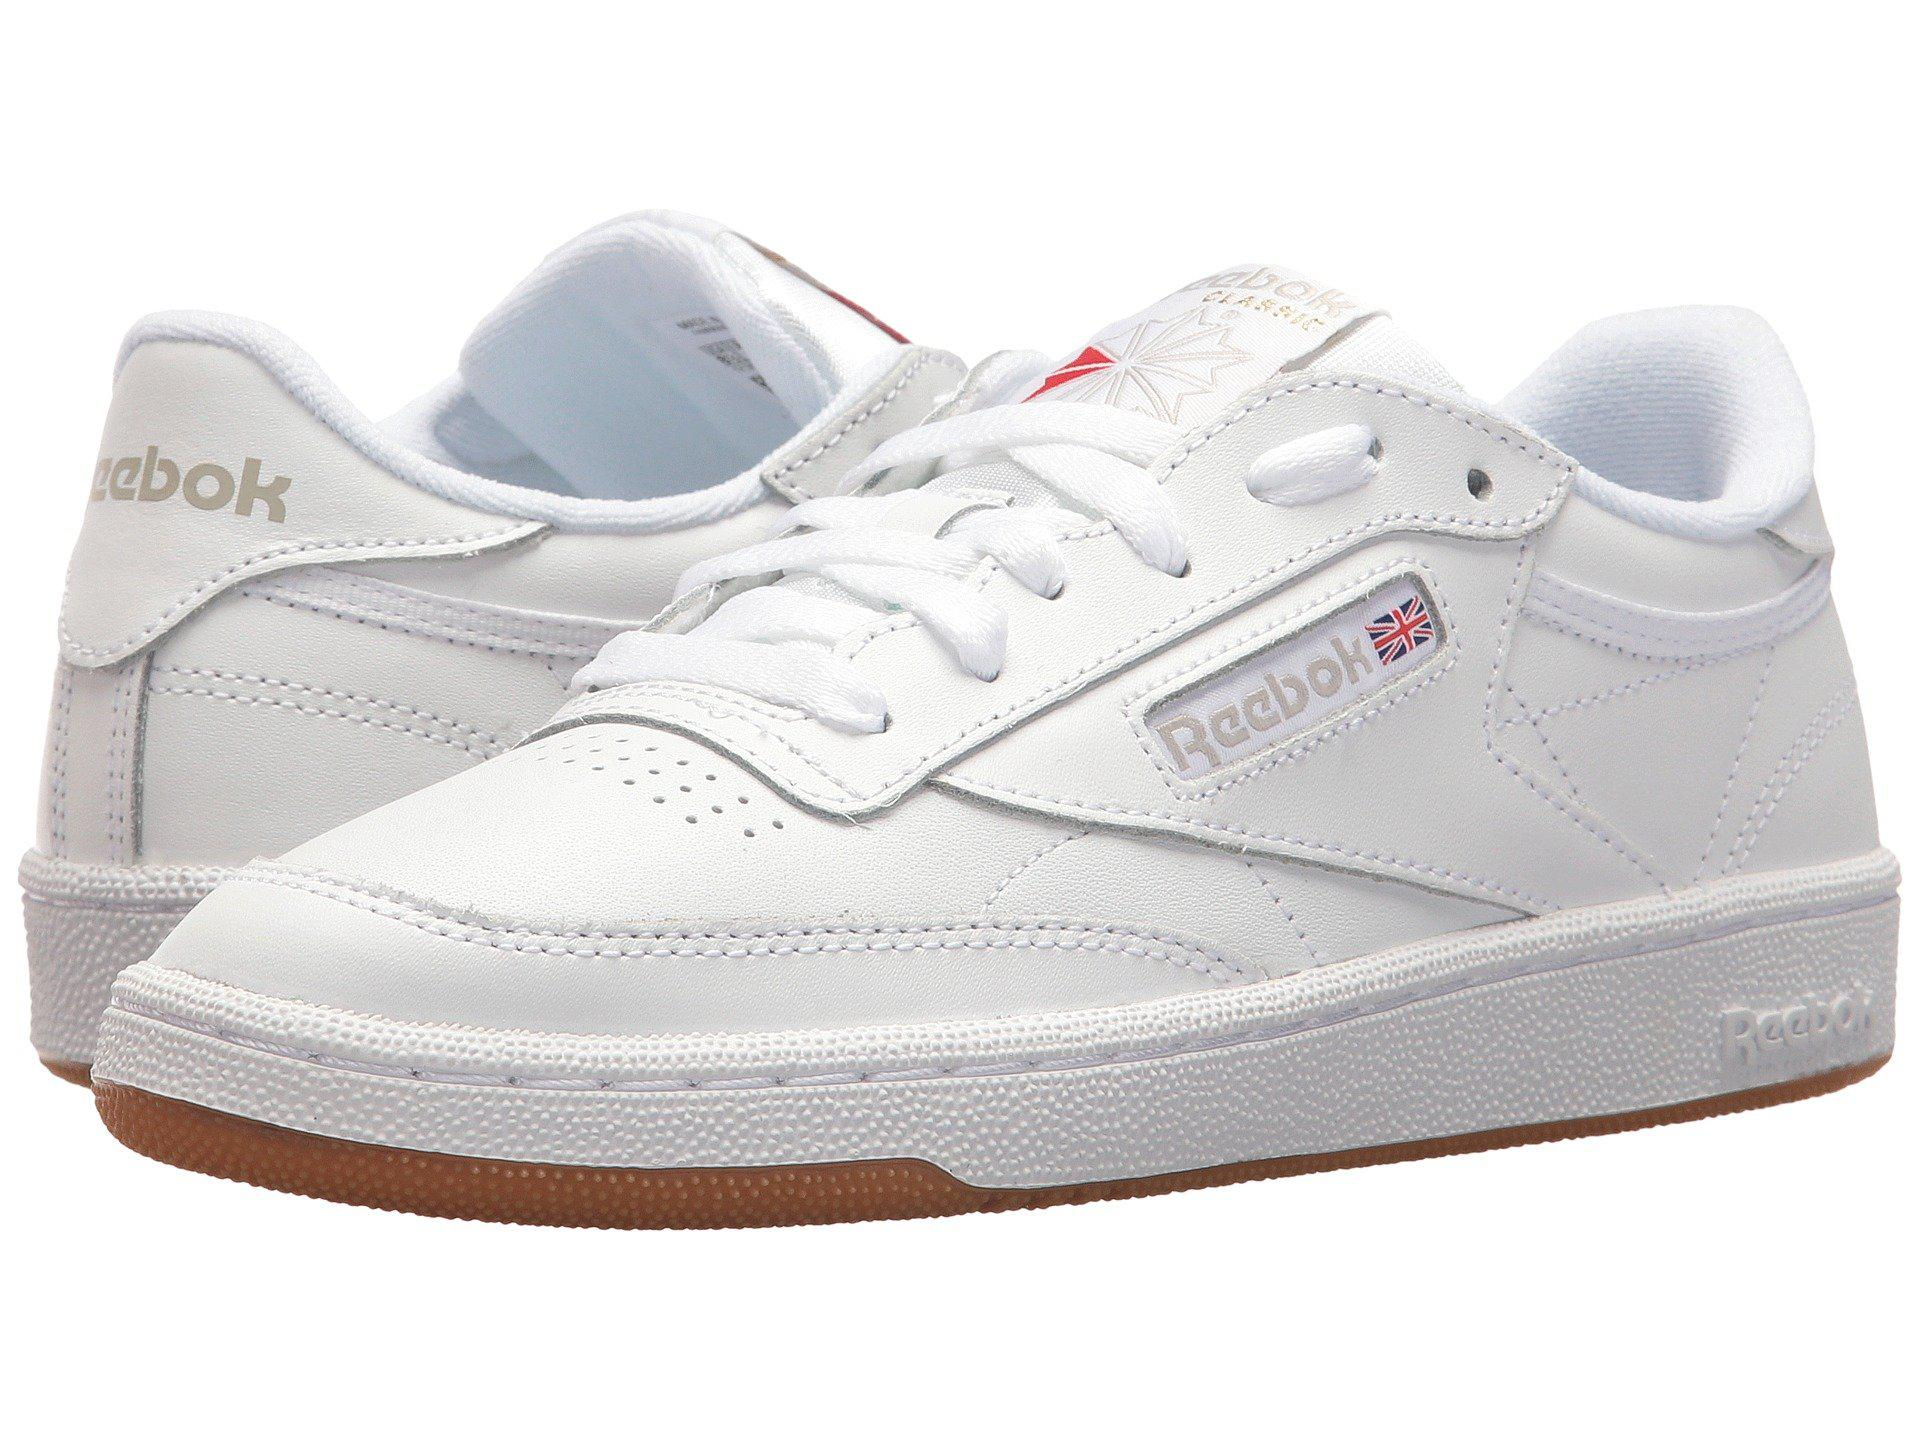 9ce9f03abc57b Reebok - Multicolor Club C 85 (white light Grey) Women s Shoes - Lyst. View  fullscreen